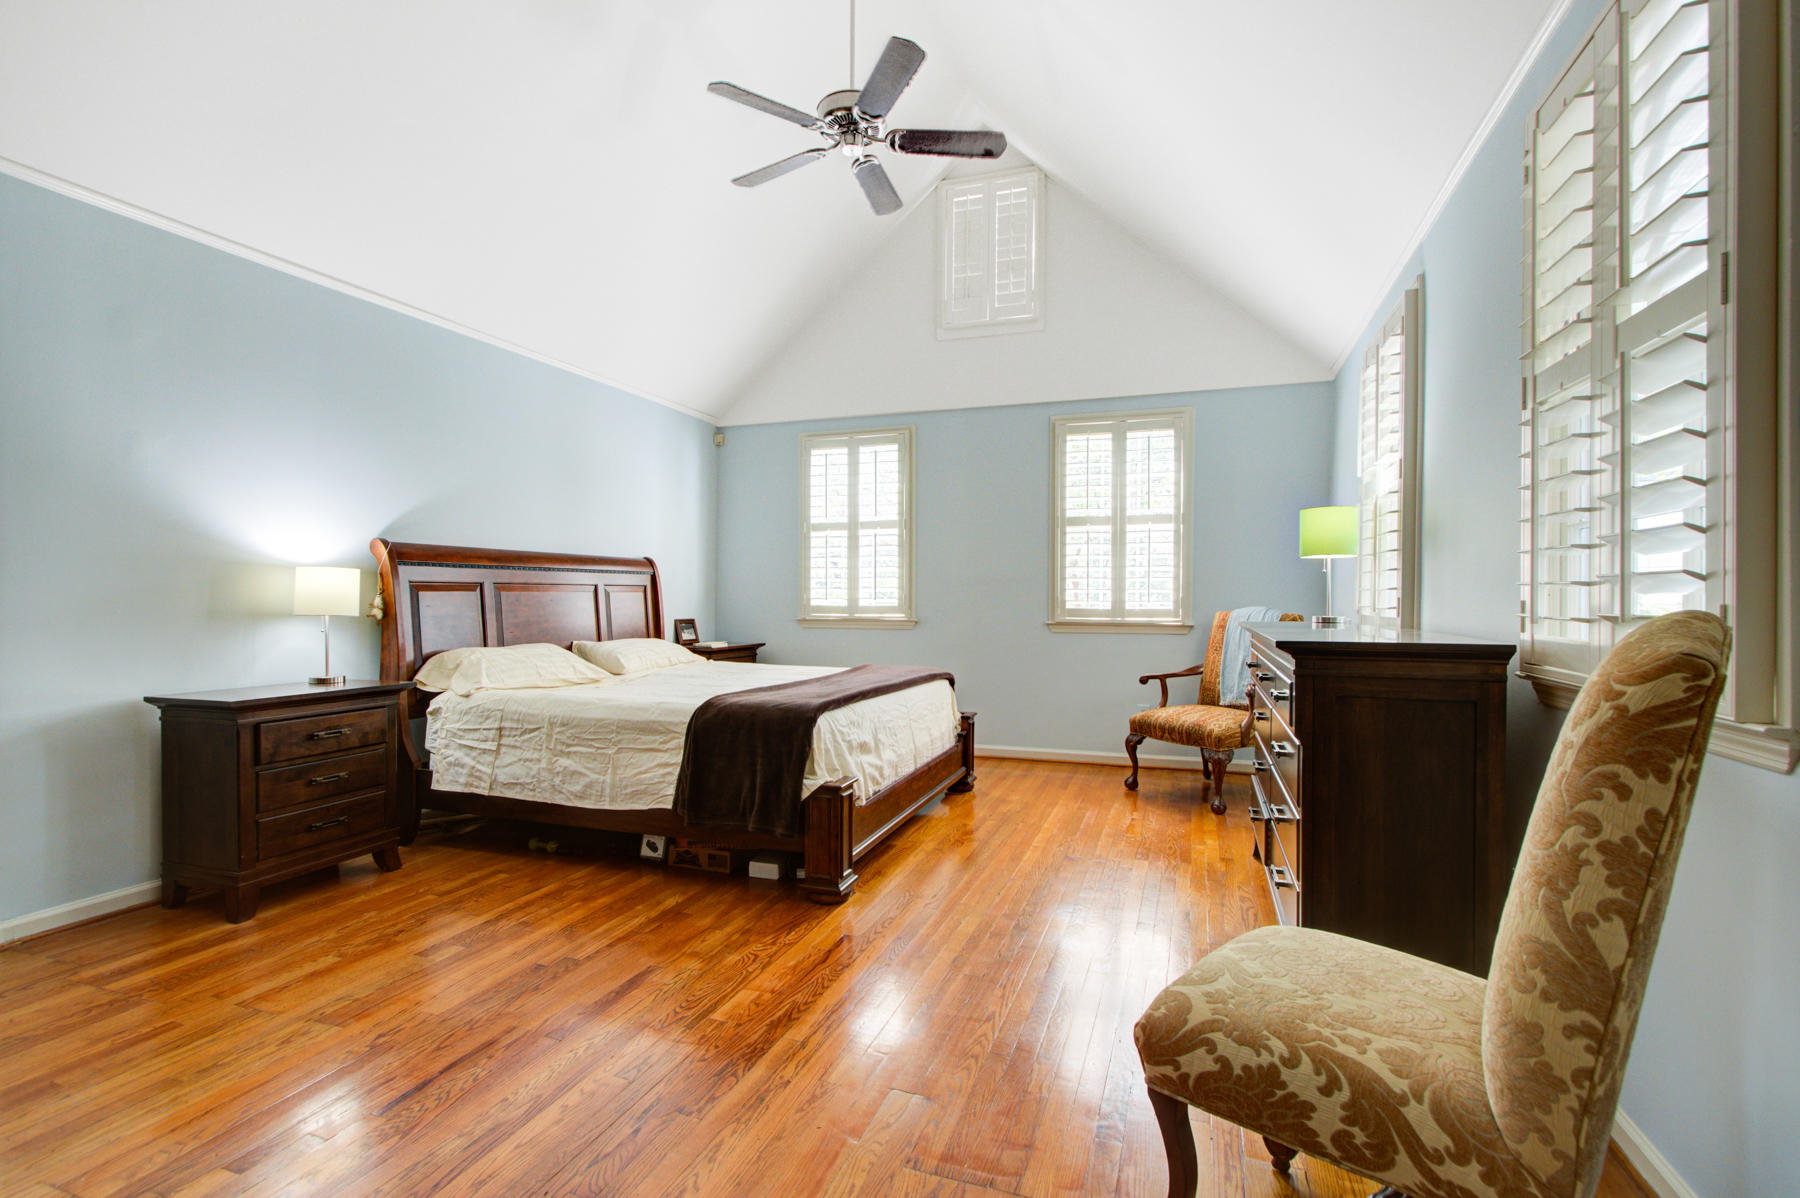 Radcliffeborough Homes For Sale - 48 Radcliffe, Charleston, SC - 4